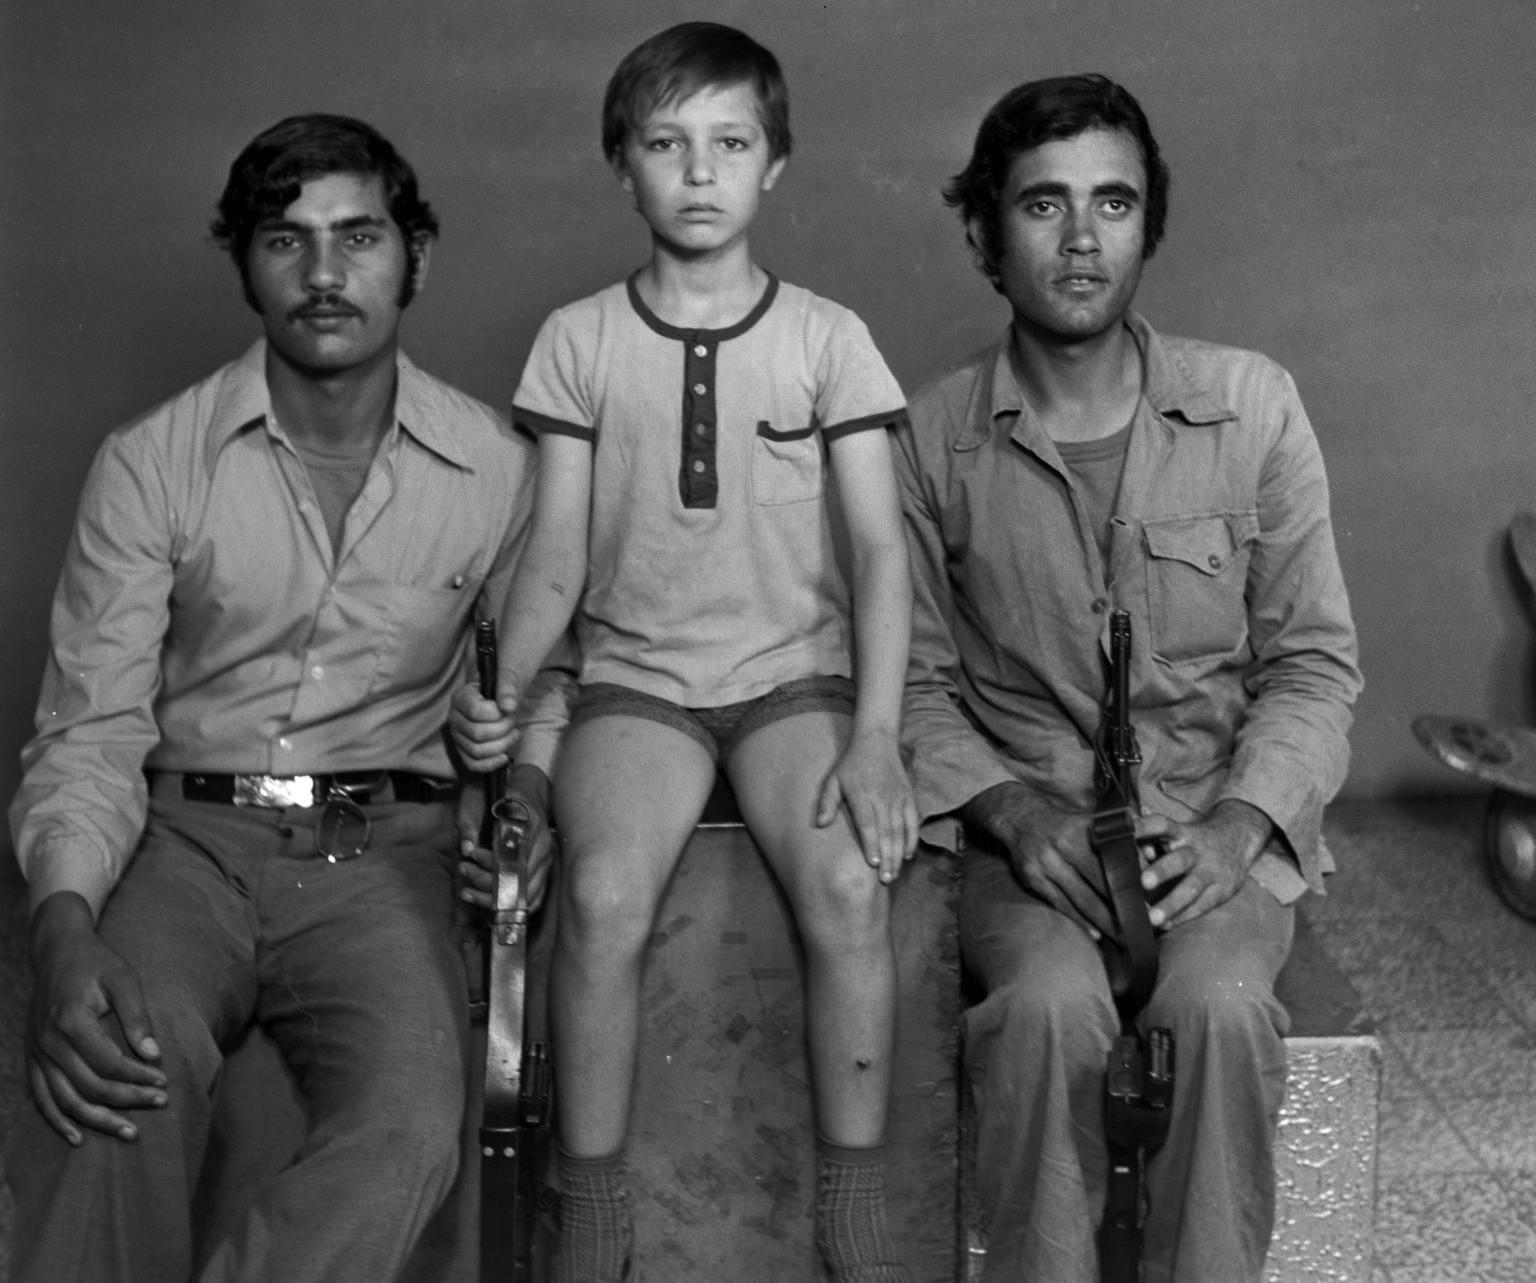 Palestinian Resistants ,Lebanon 1968-72 by Akram Zaatari.